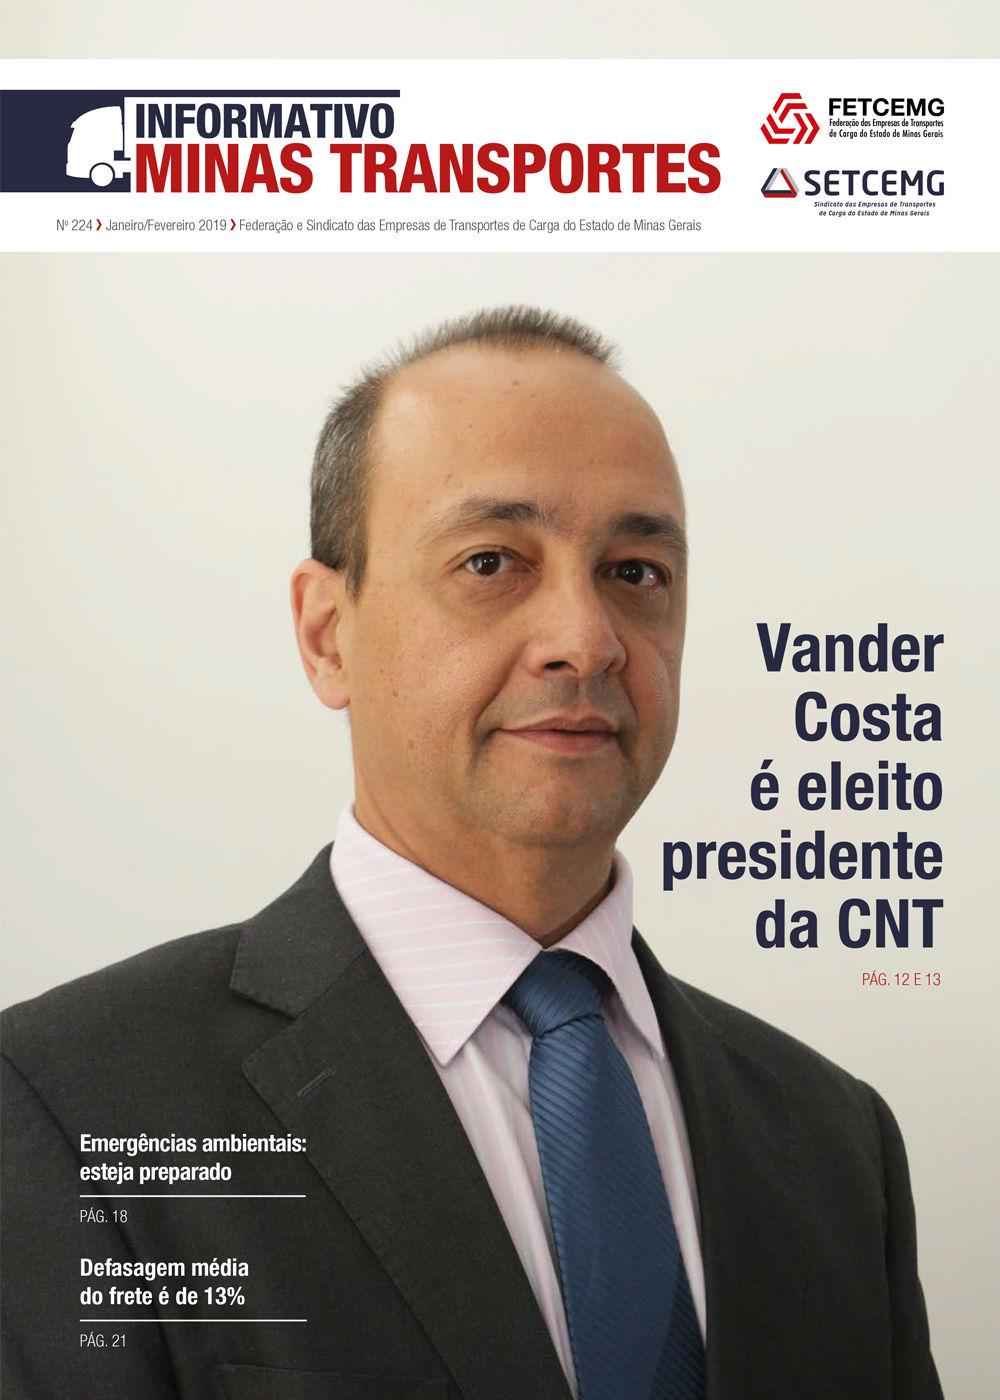 Informativo Minas Transportes - nº 224